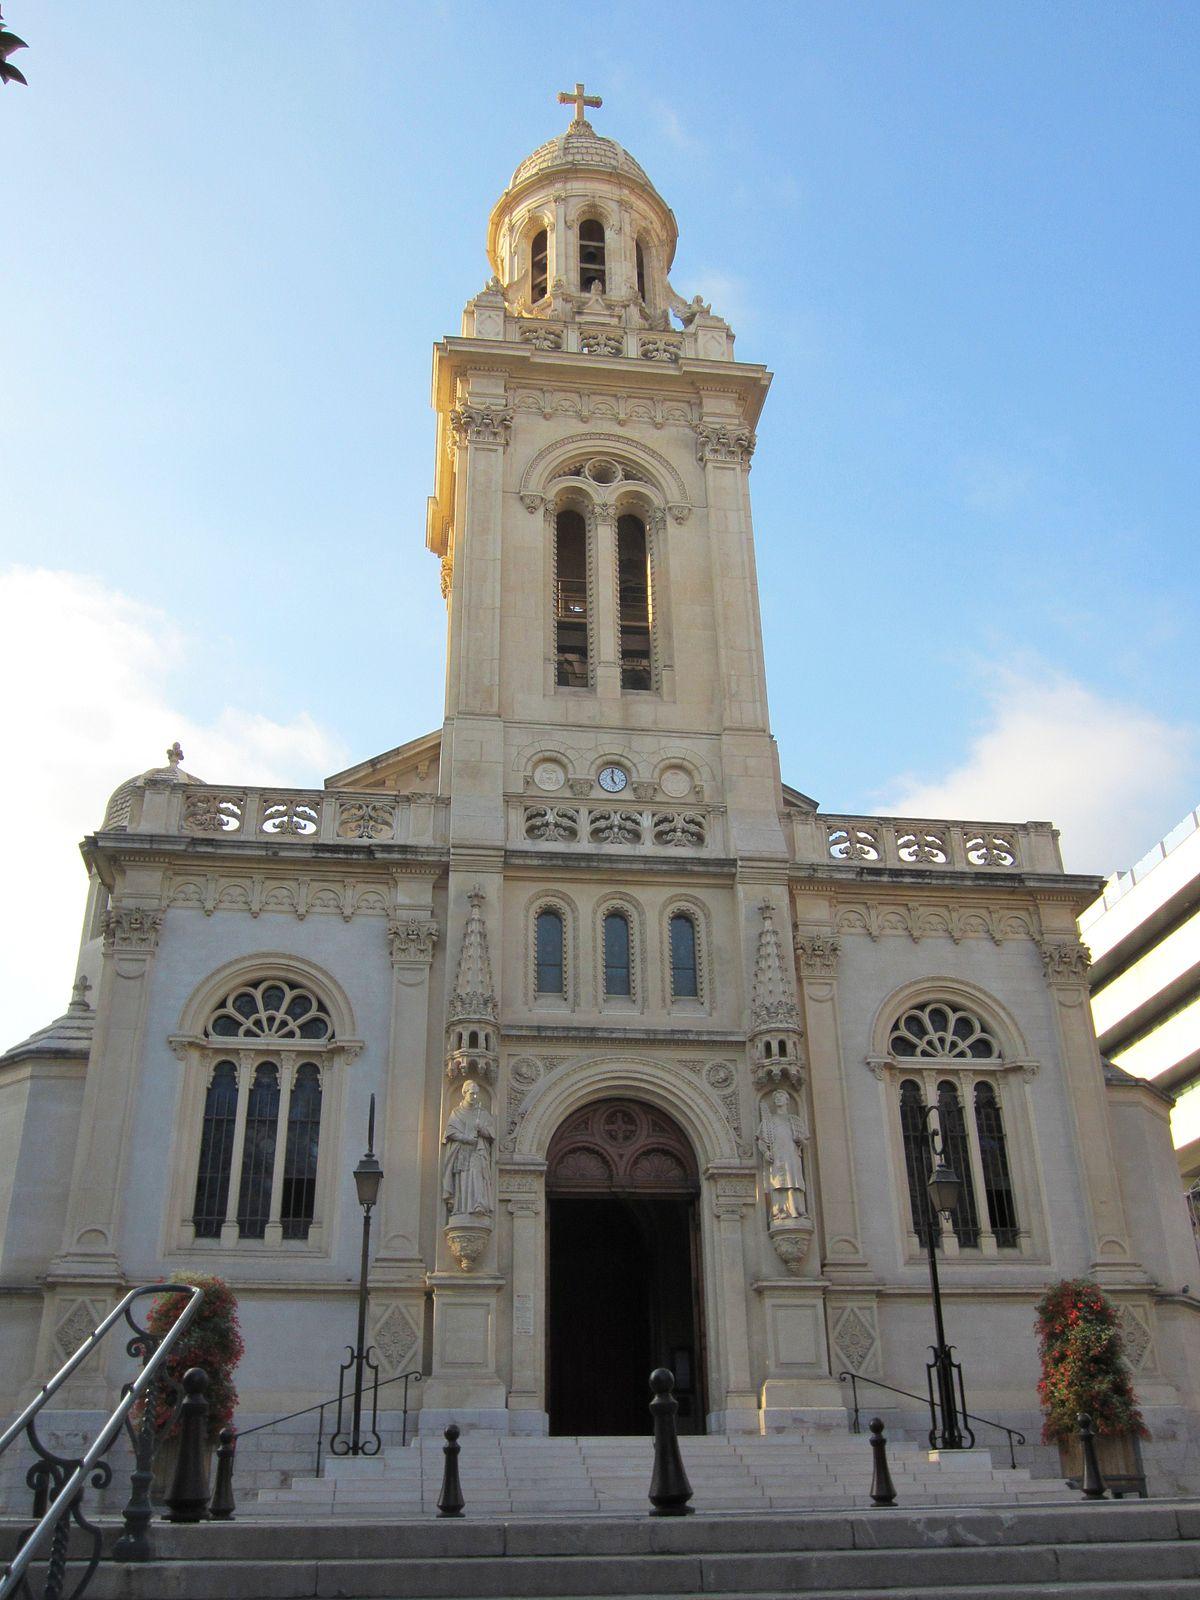 Eglise st charles Monaco.jpg